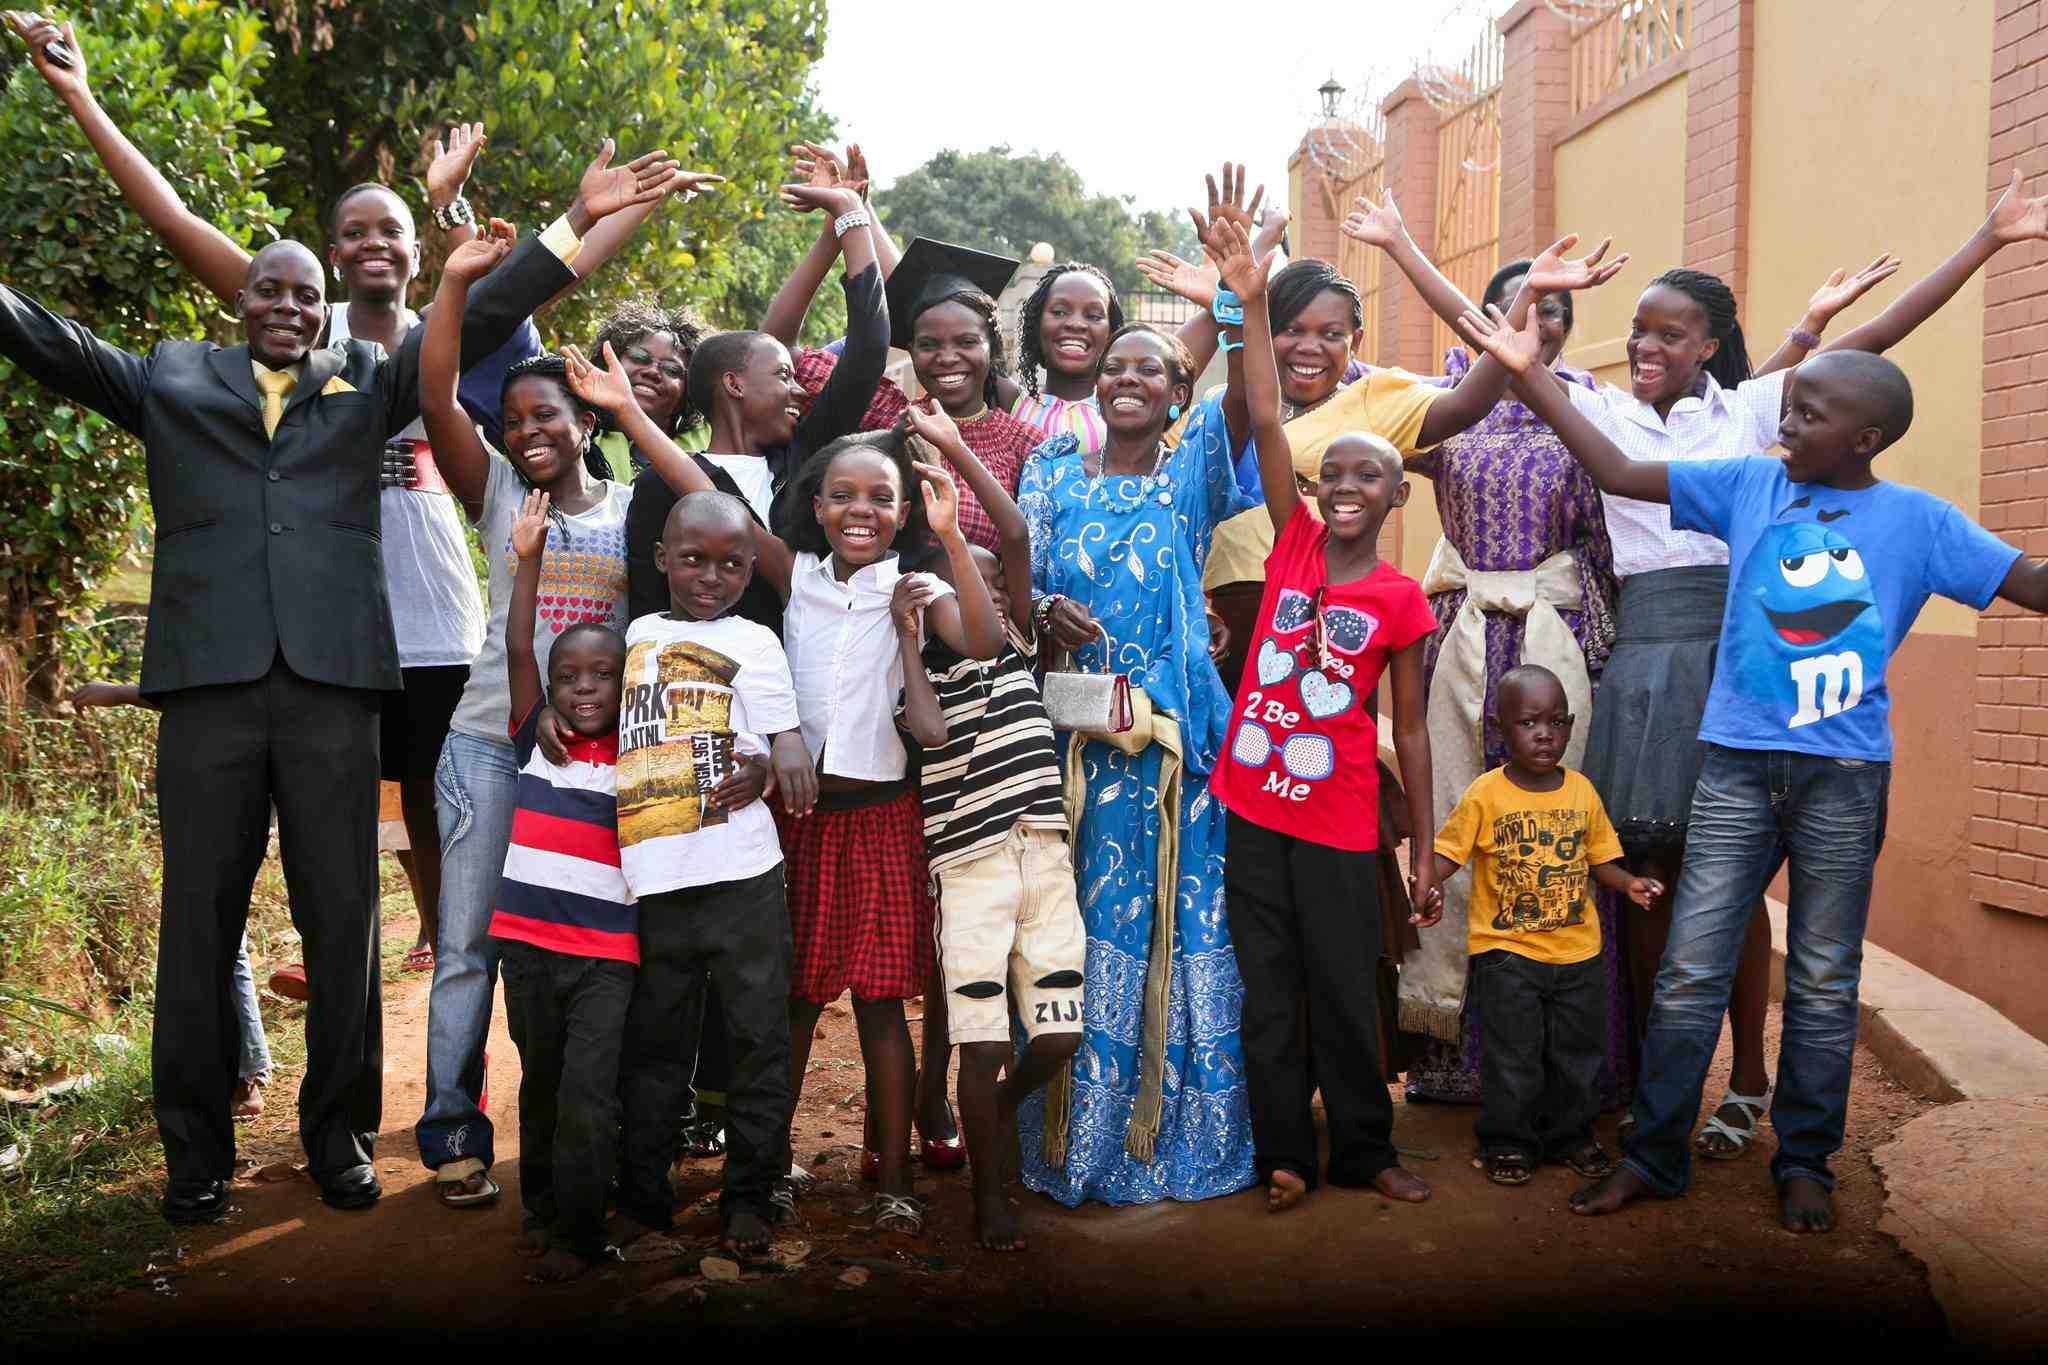 http://images.huffingtonpost.com/2013-09-09-UgandaProjectpeeps.jpg